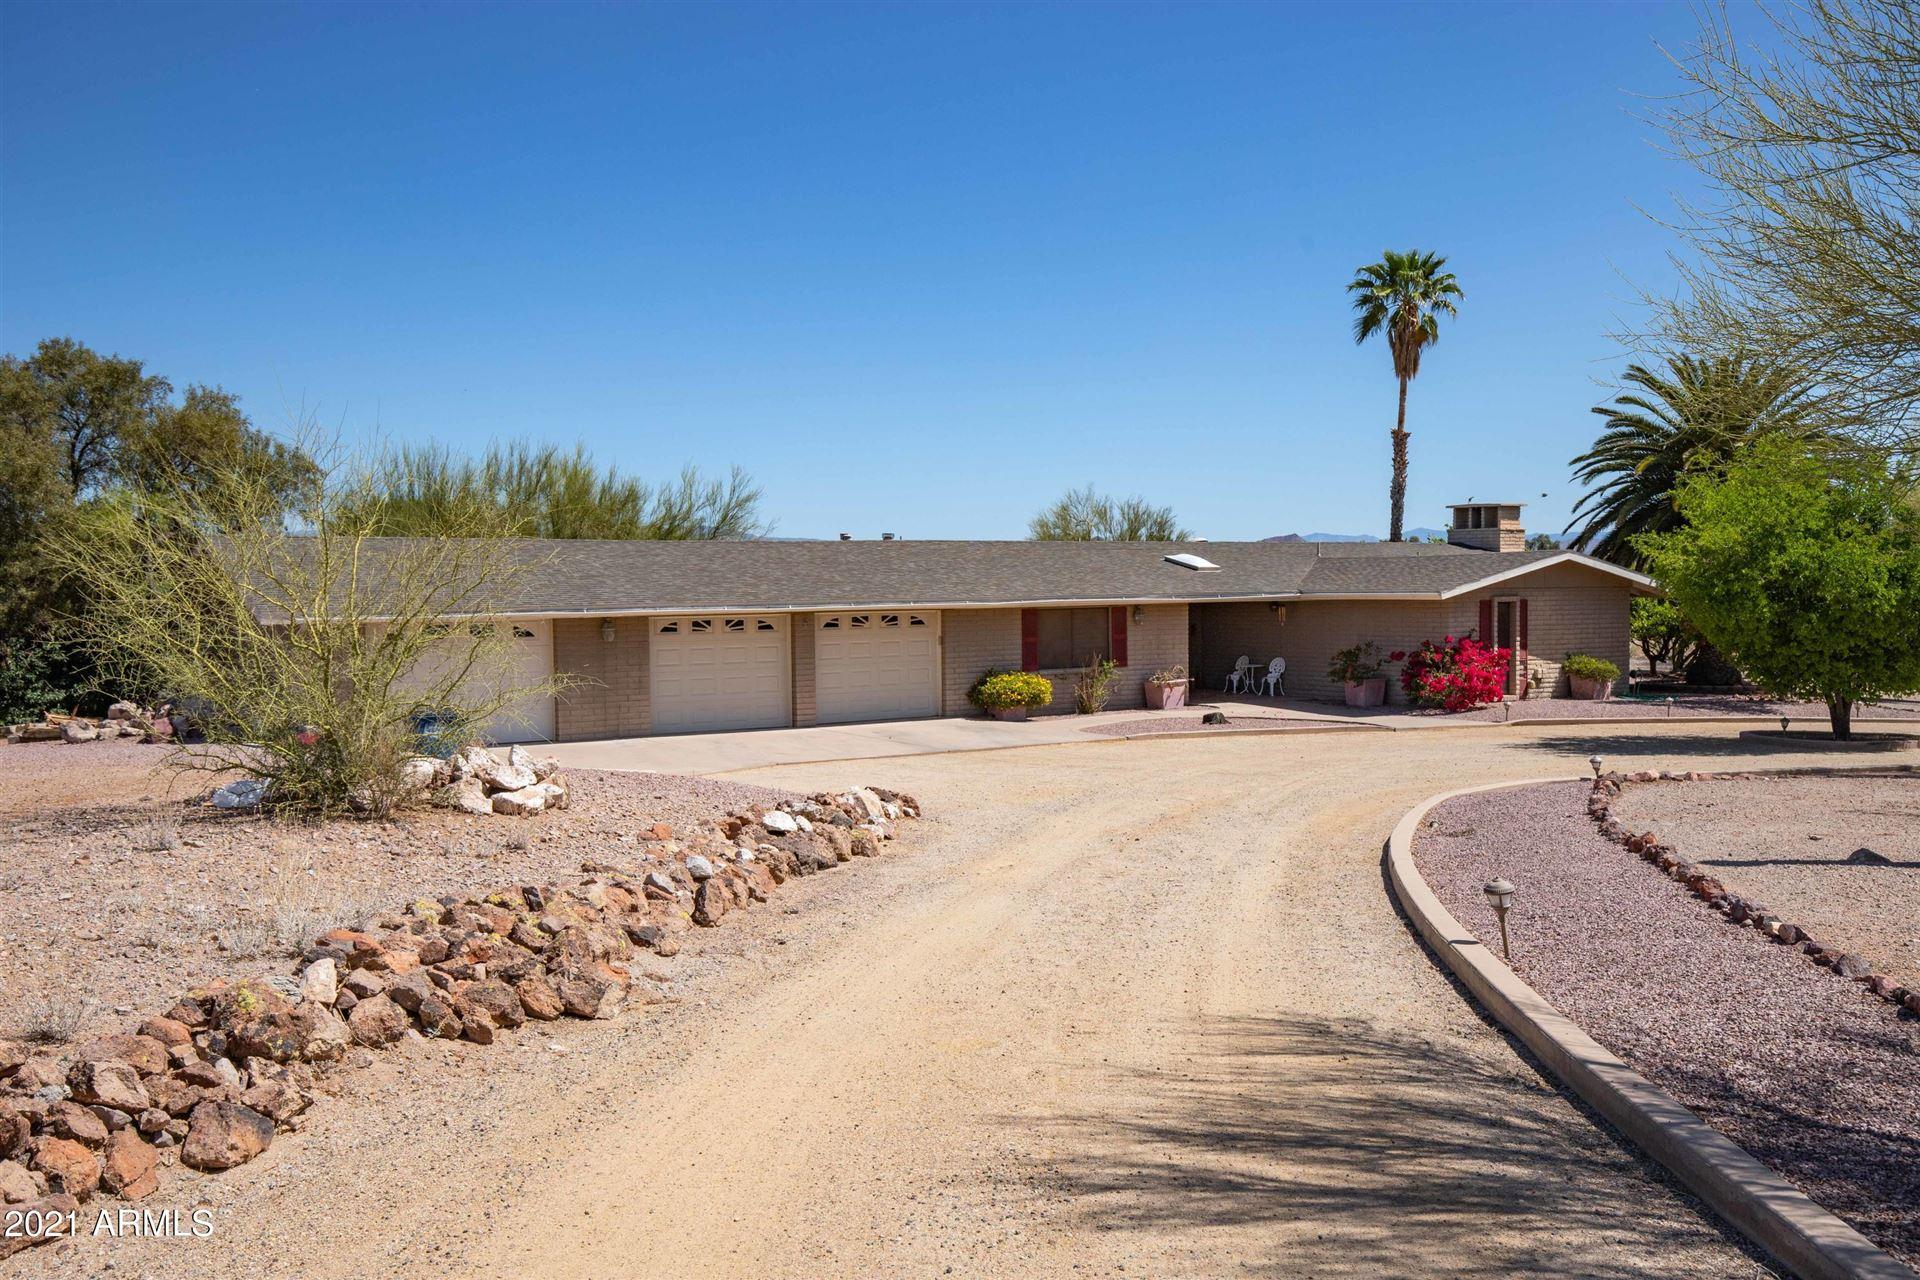 1810 Loma Linda Drive, Wickenburg, AZ 85390 - #: 6221151